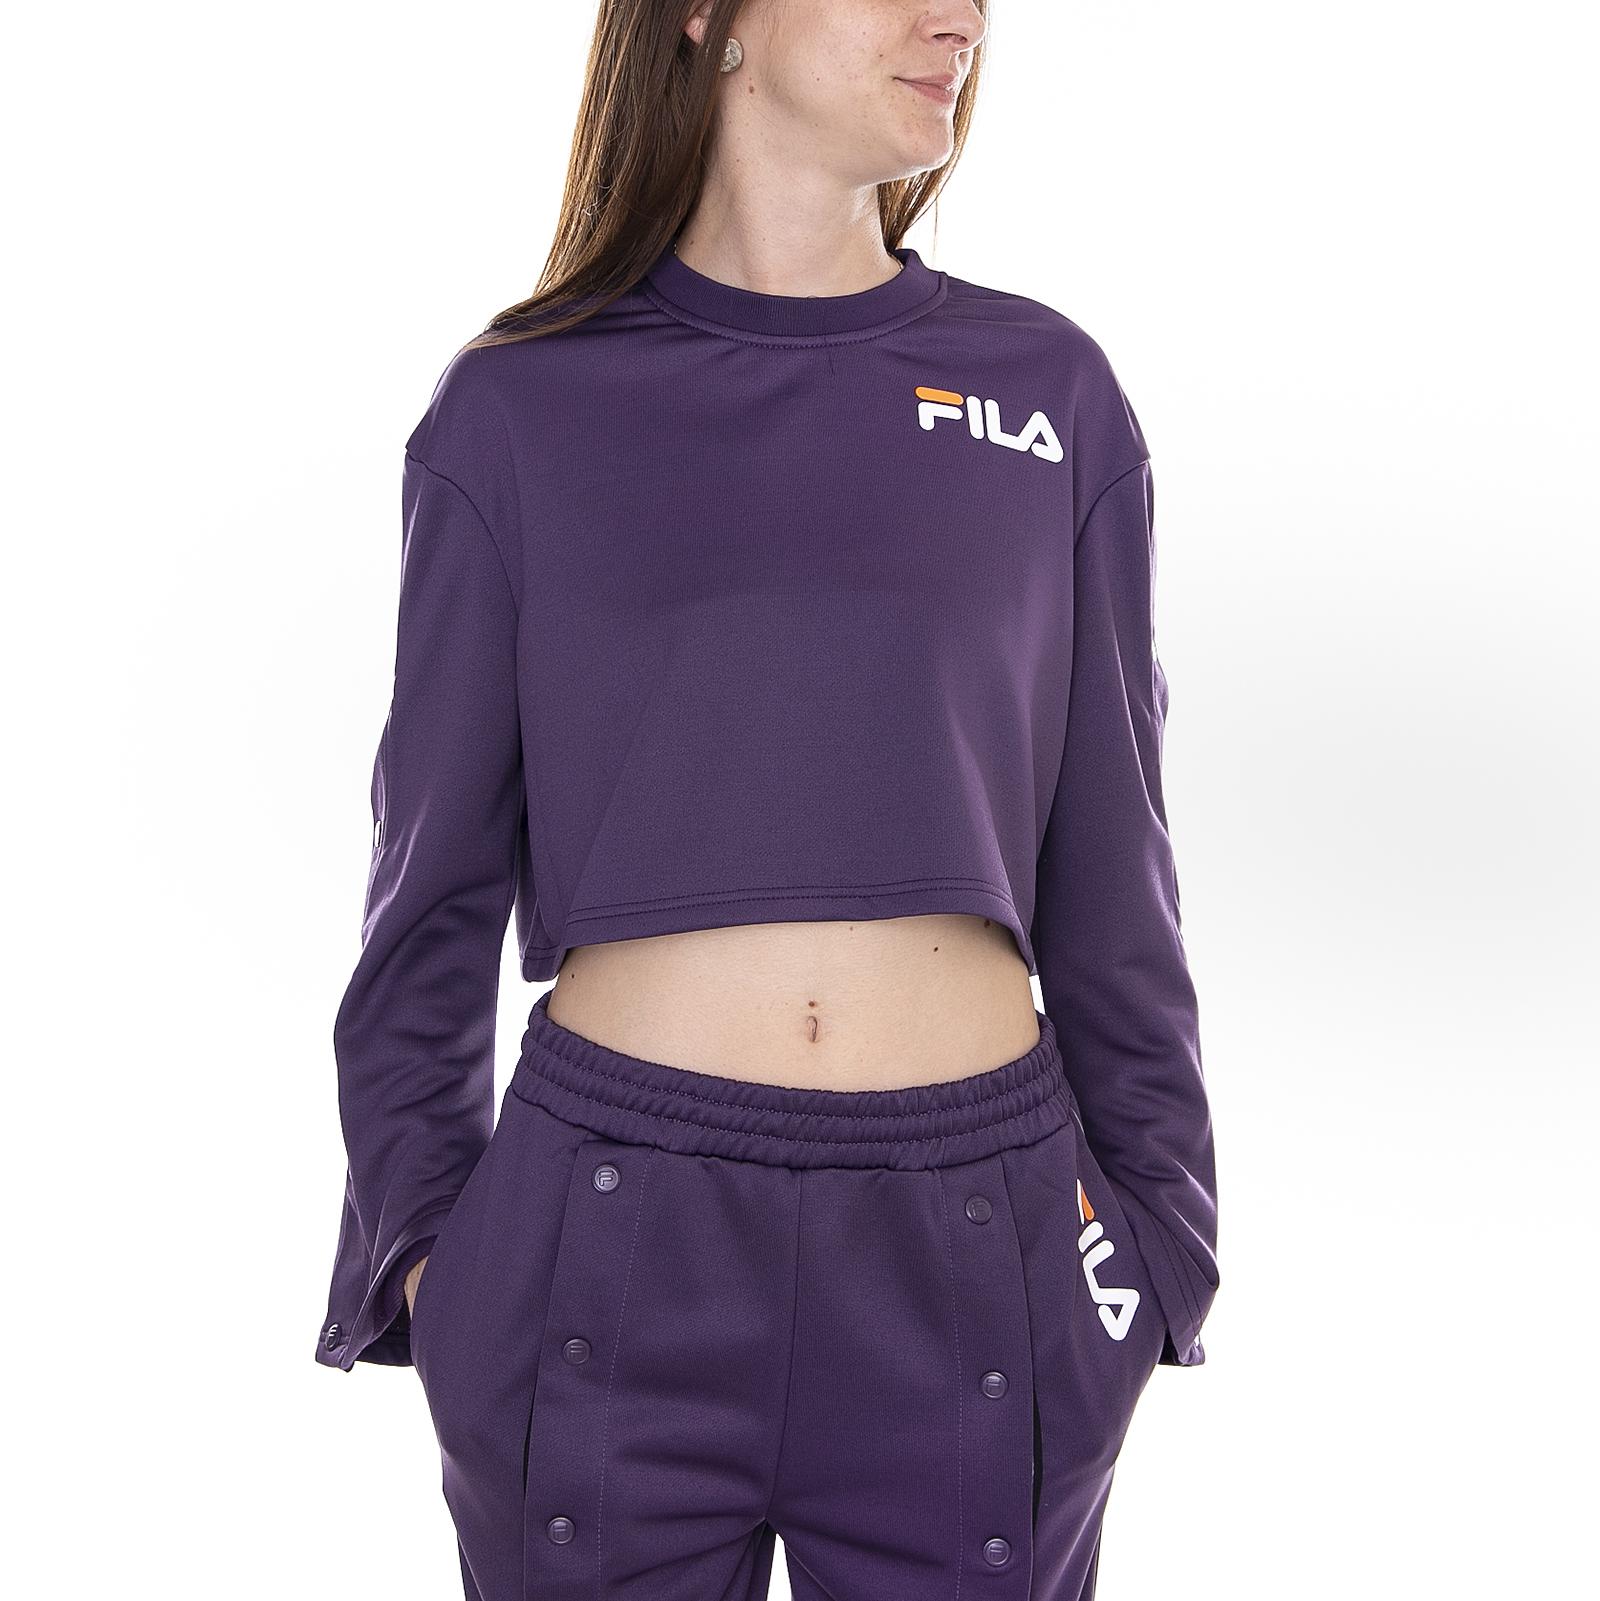 Details Flared Snap Purple Fila Aurora Violet About Sweatshirts YgI7vmbf6y